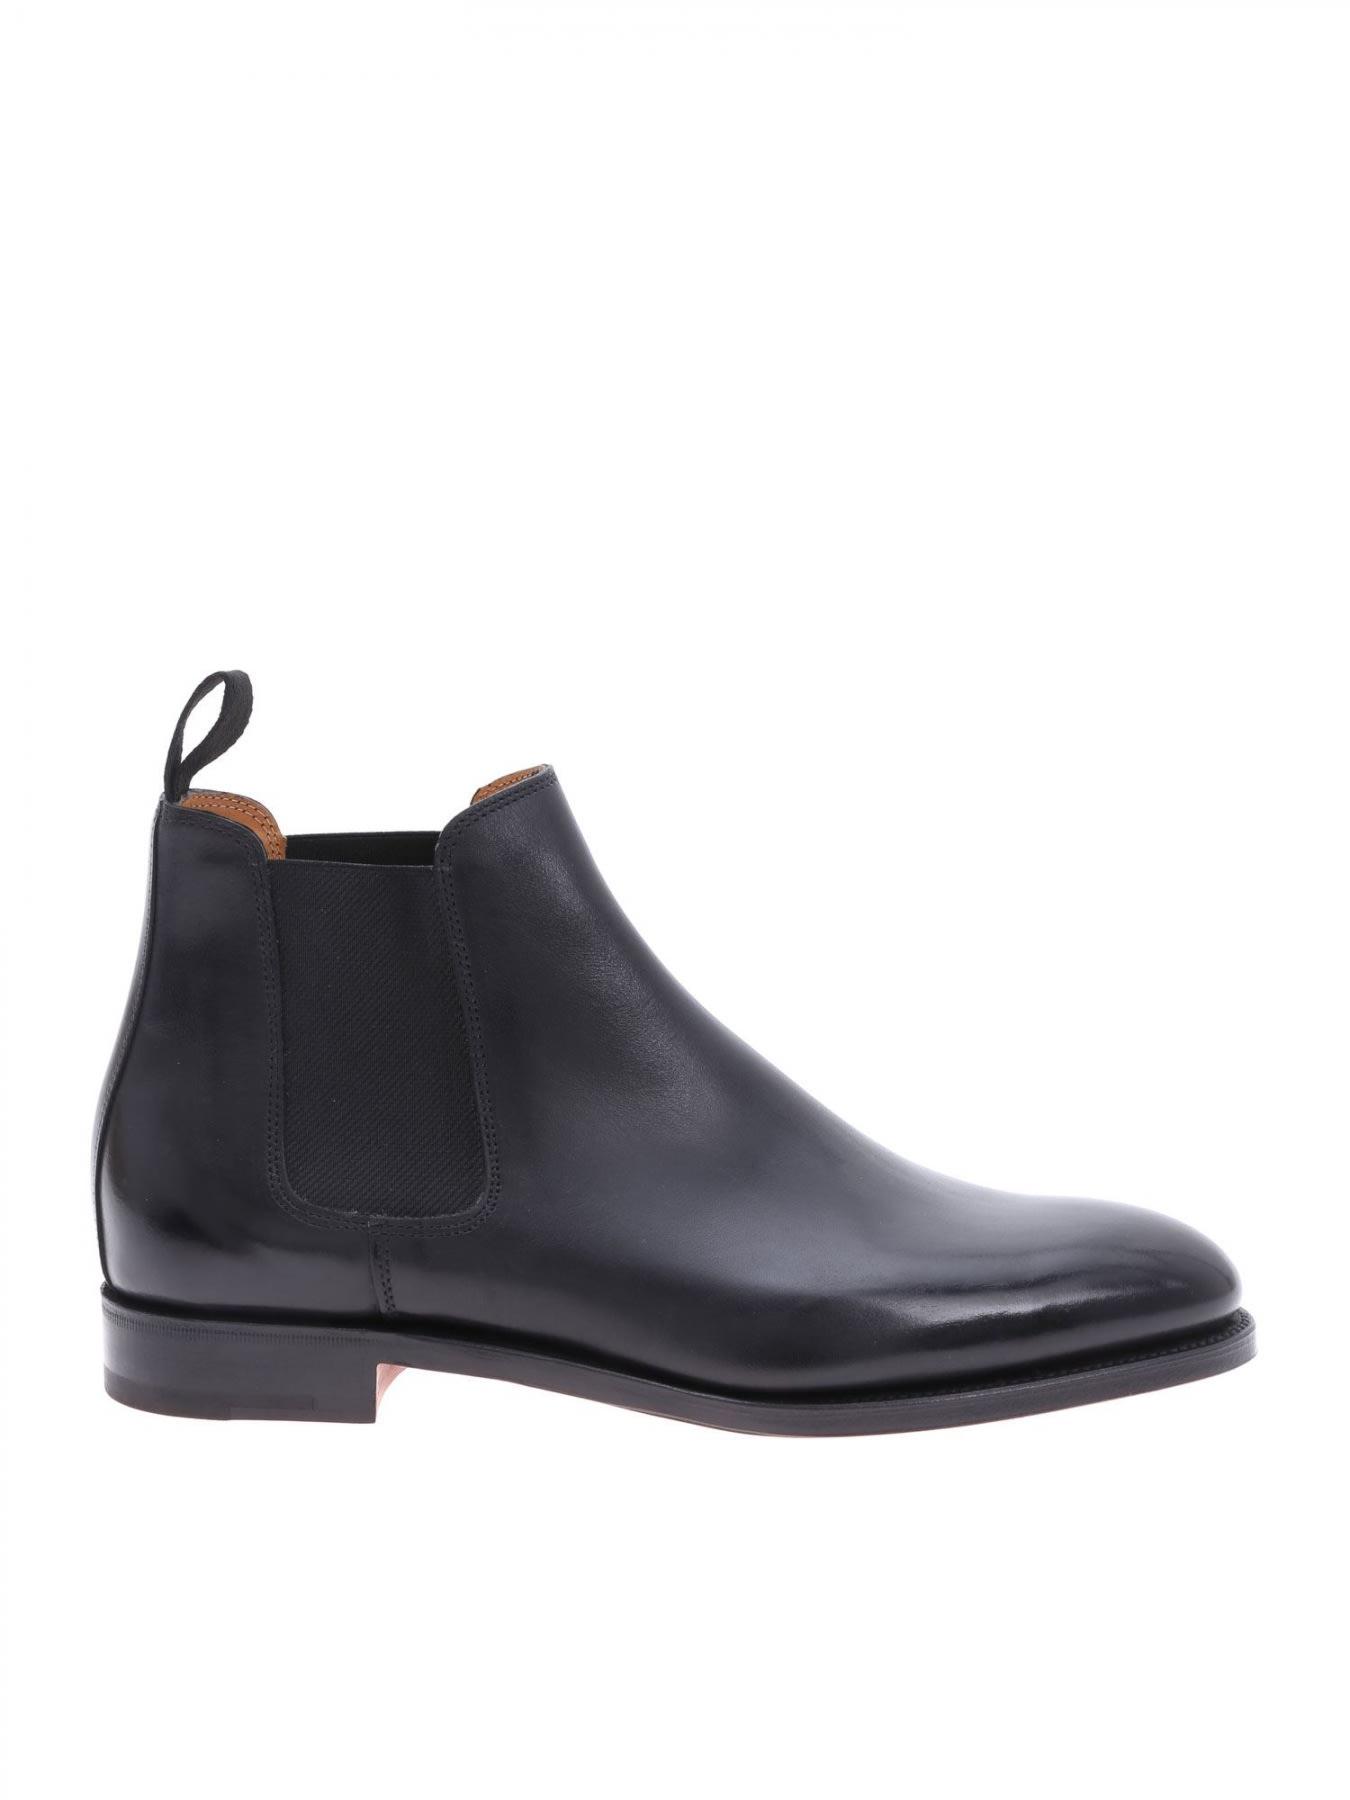 John Lobb Boots Chelsea